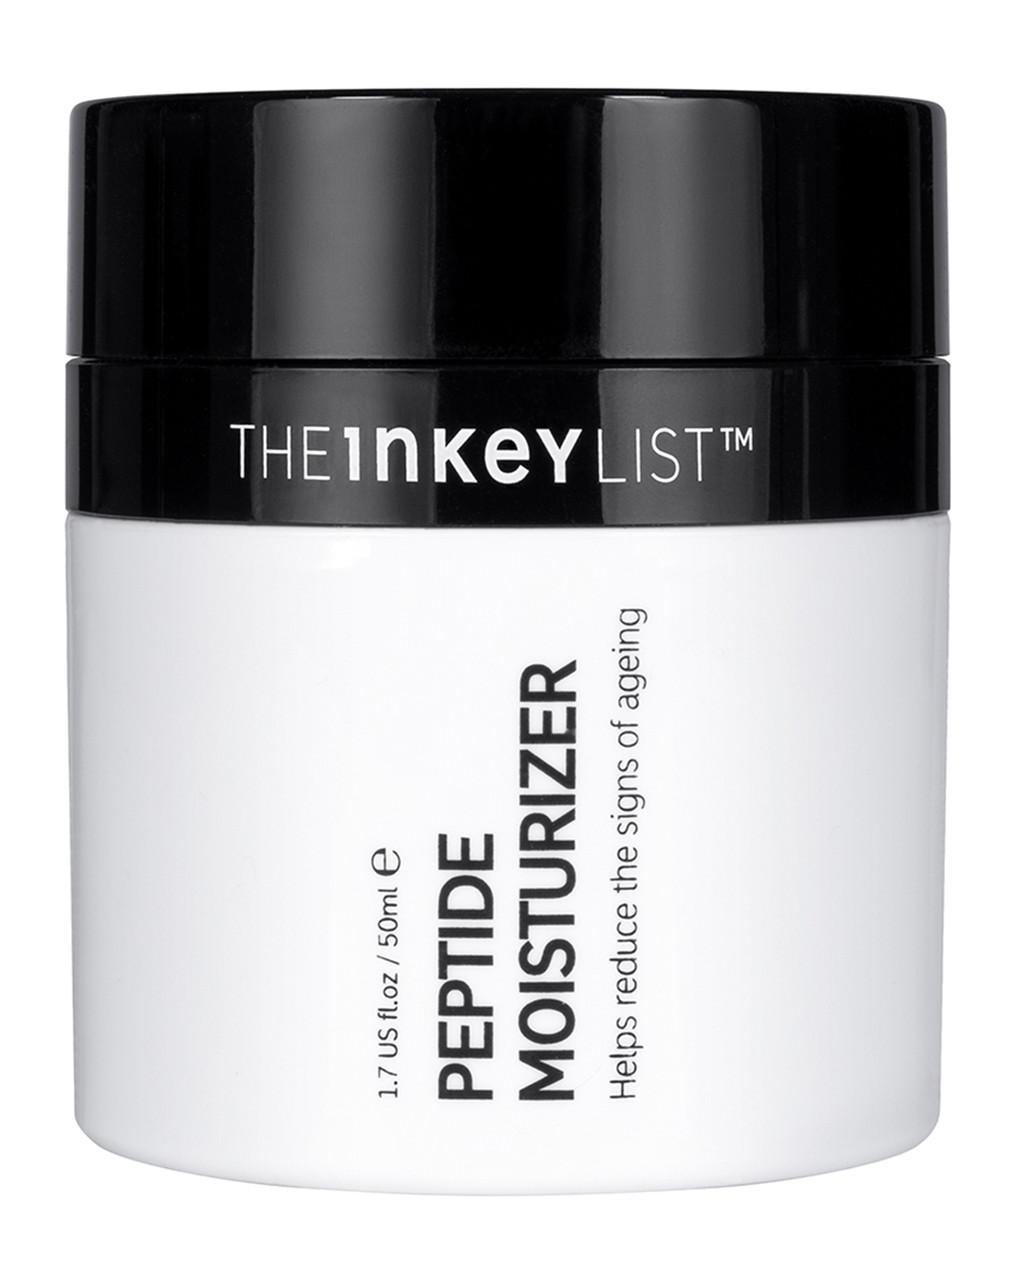 Увлажняющий крем для лица с пептидами The Inkey List Peptide Moisturizer 50 мл